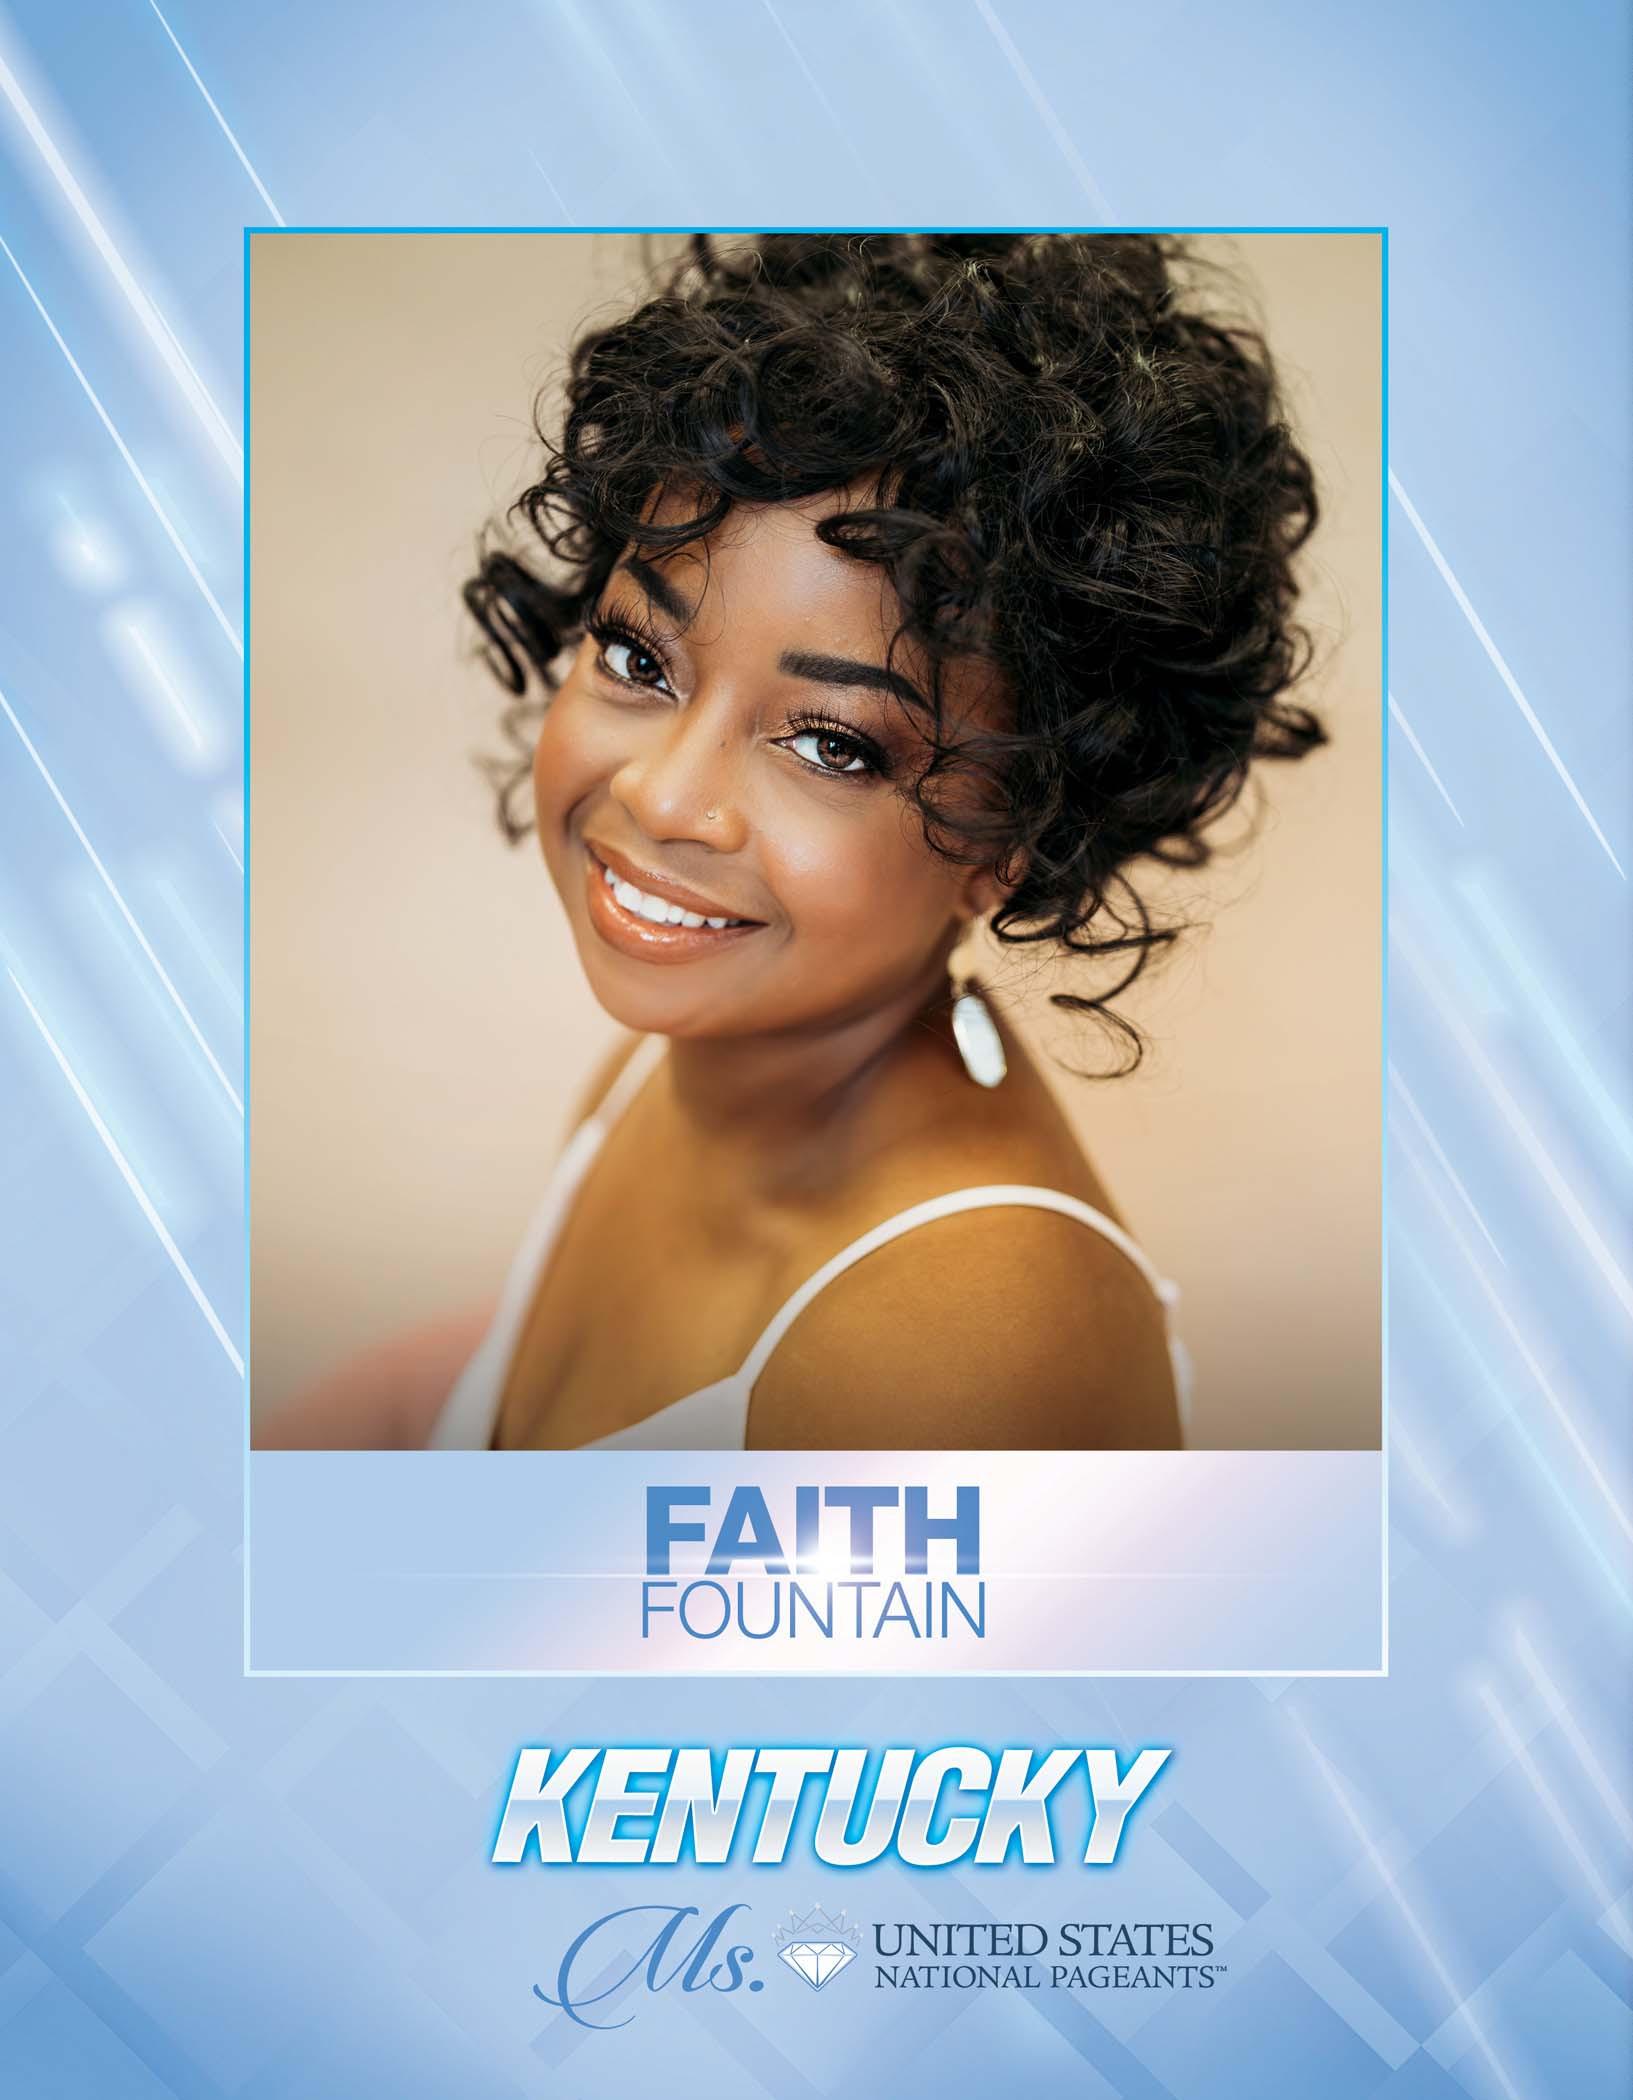 Faith Fountain Ms. Kentucky United States - 2021